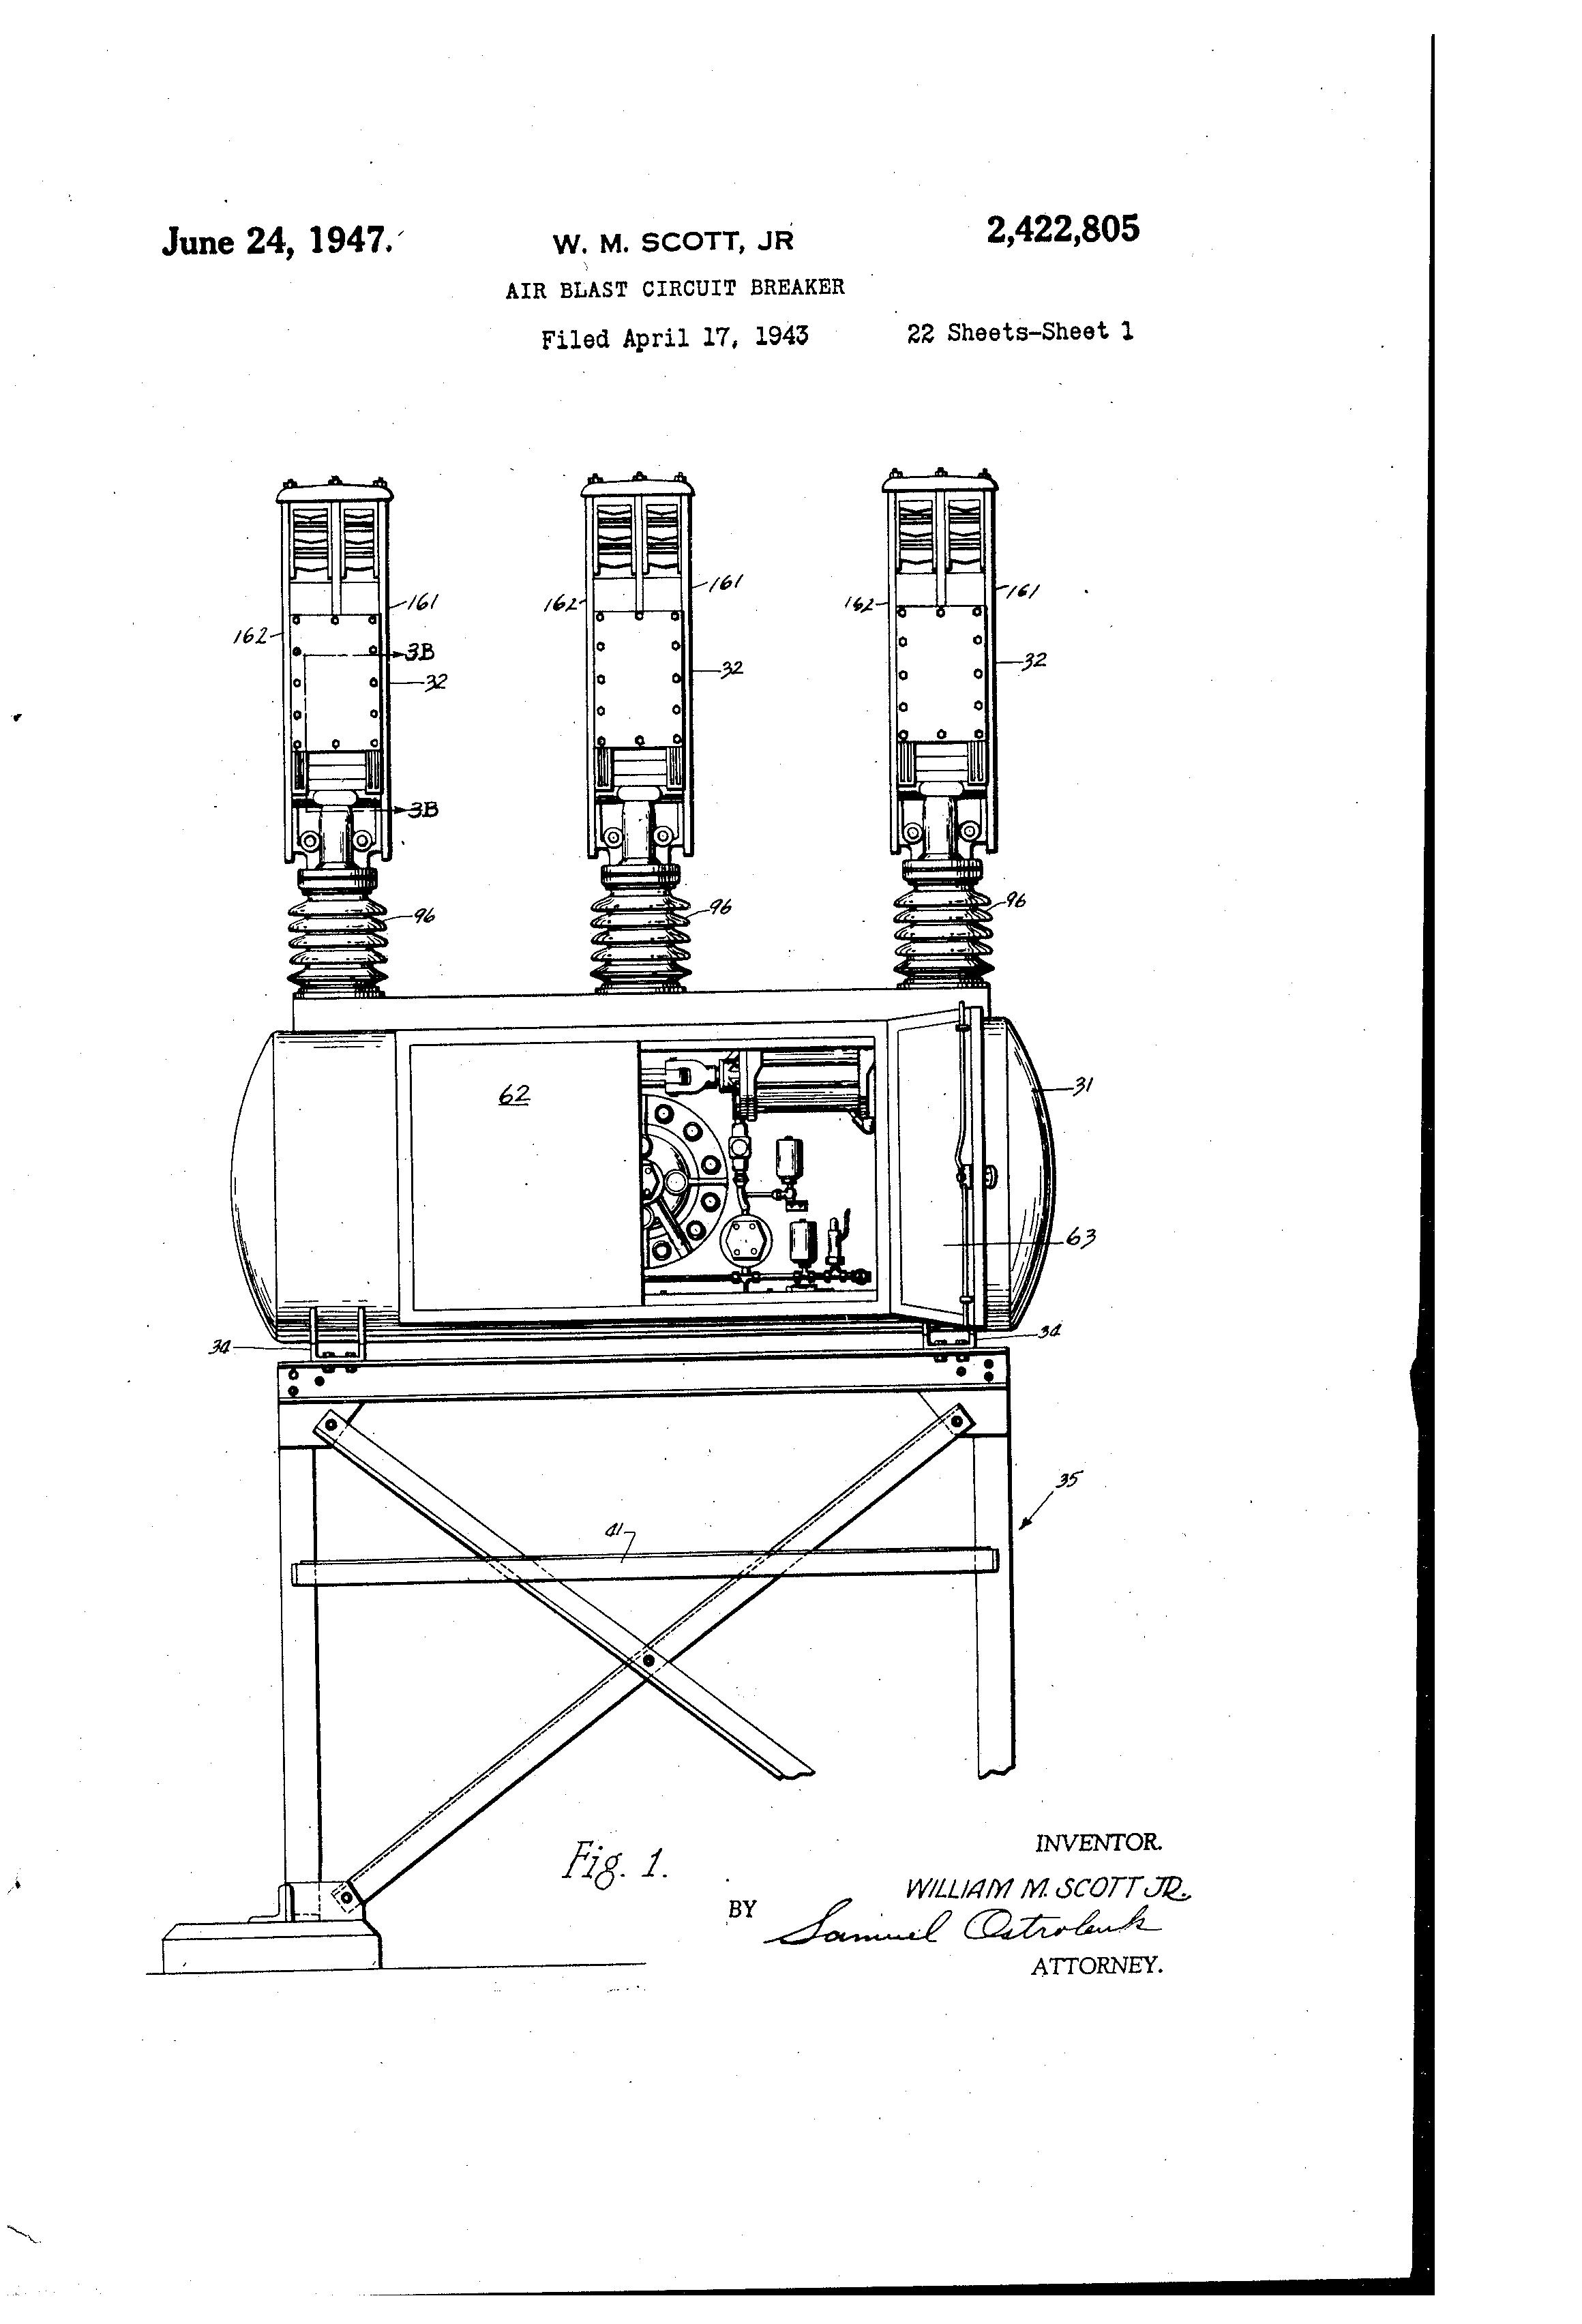 patent us2422805 - air blast circuit breaker